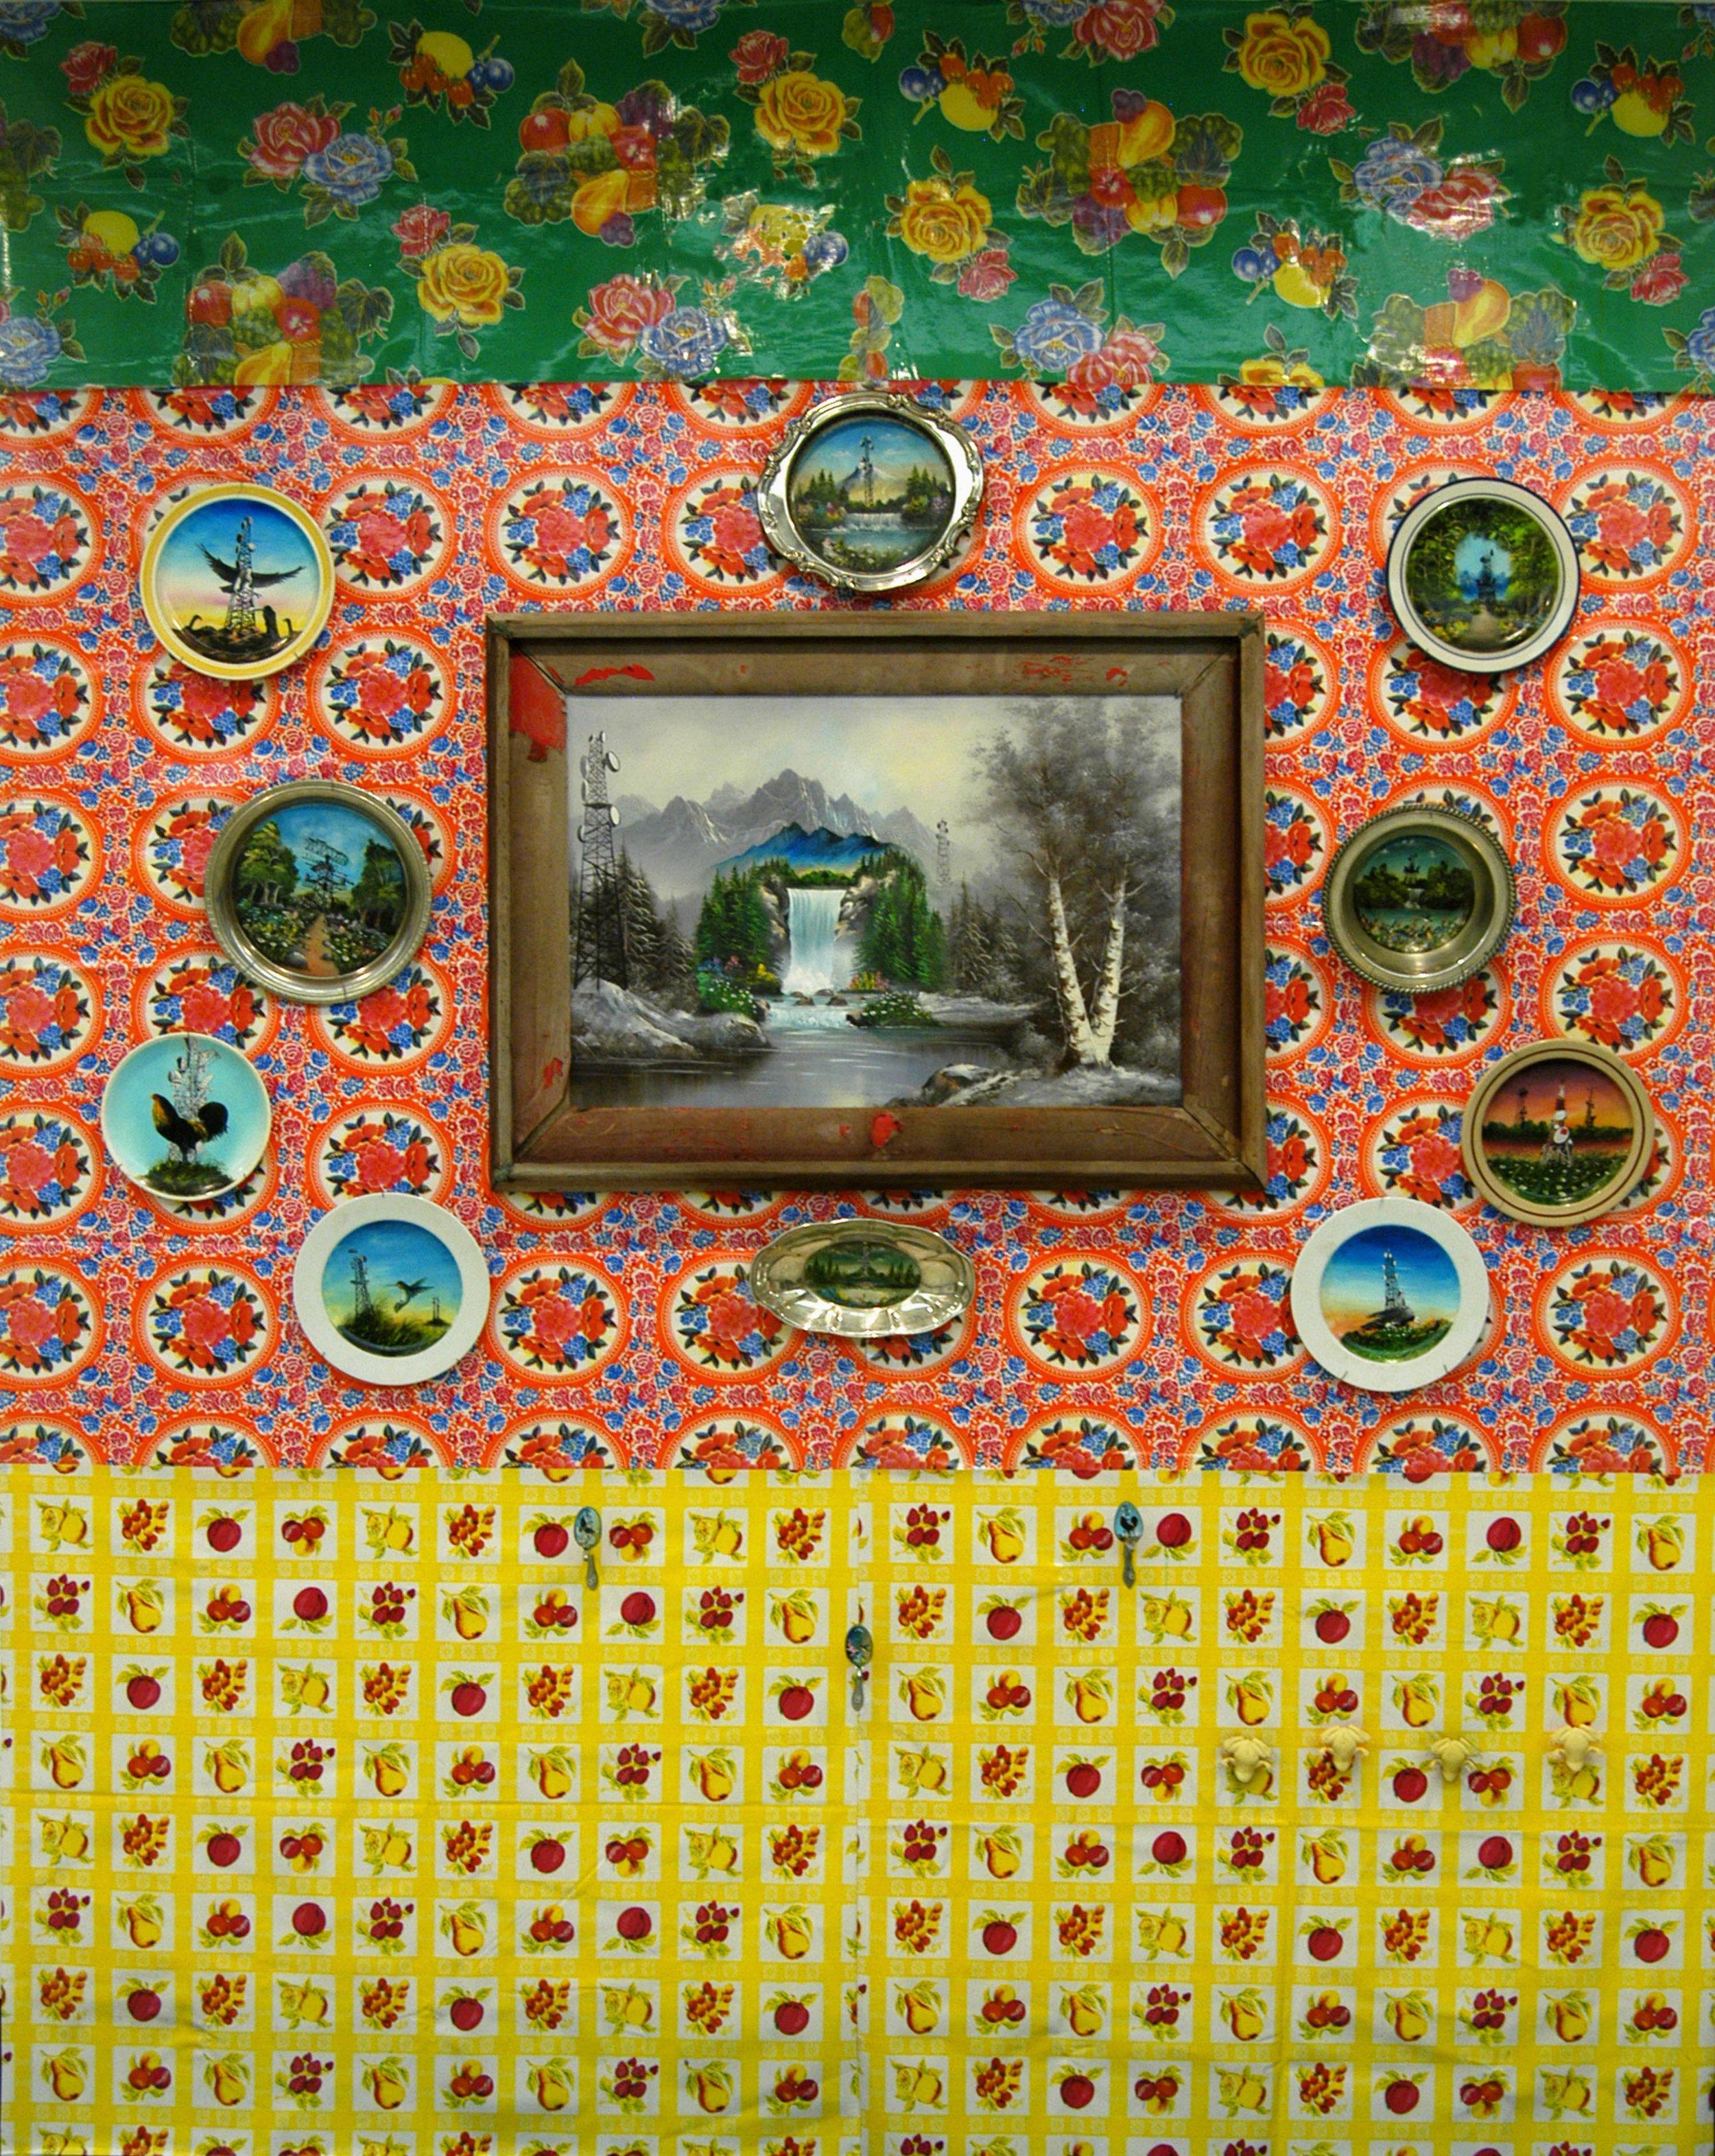 """Tablecloth and Plates Wall""  Mixed media  Variable dimension"